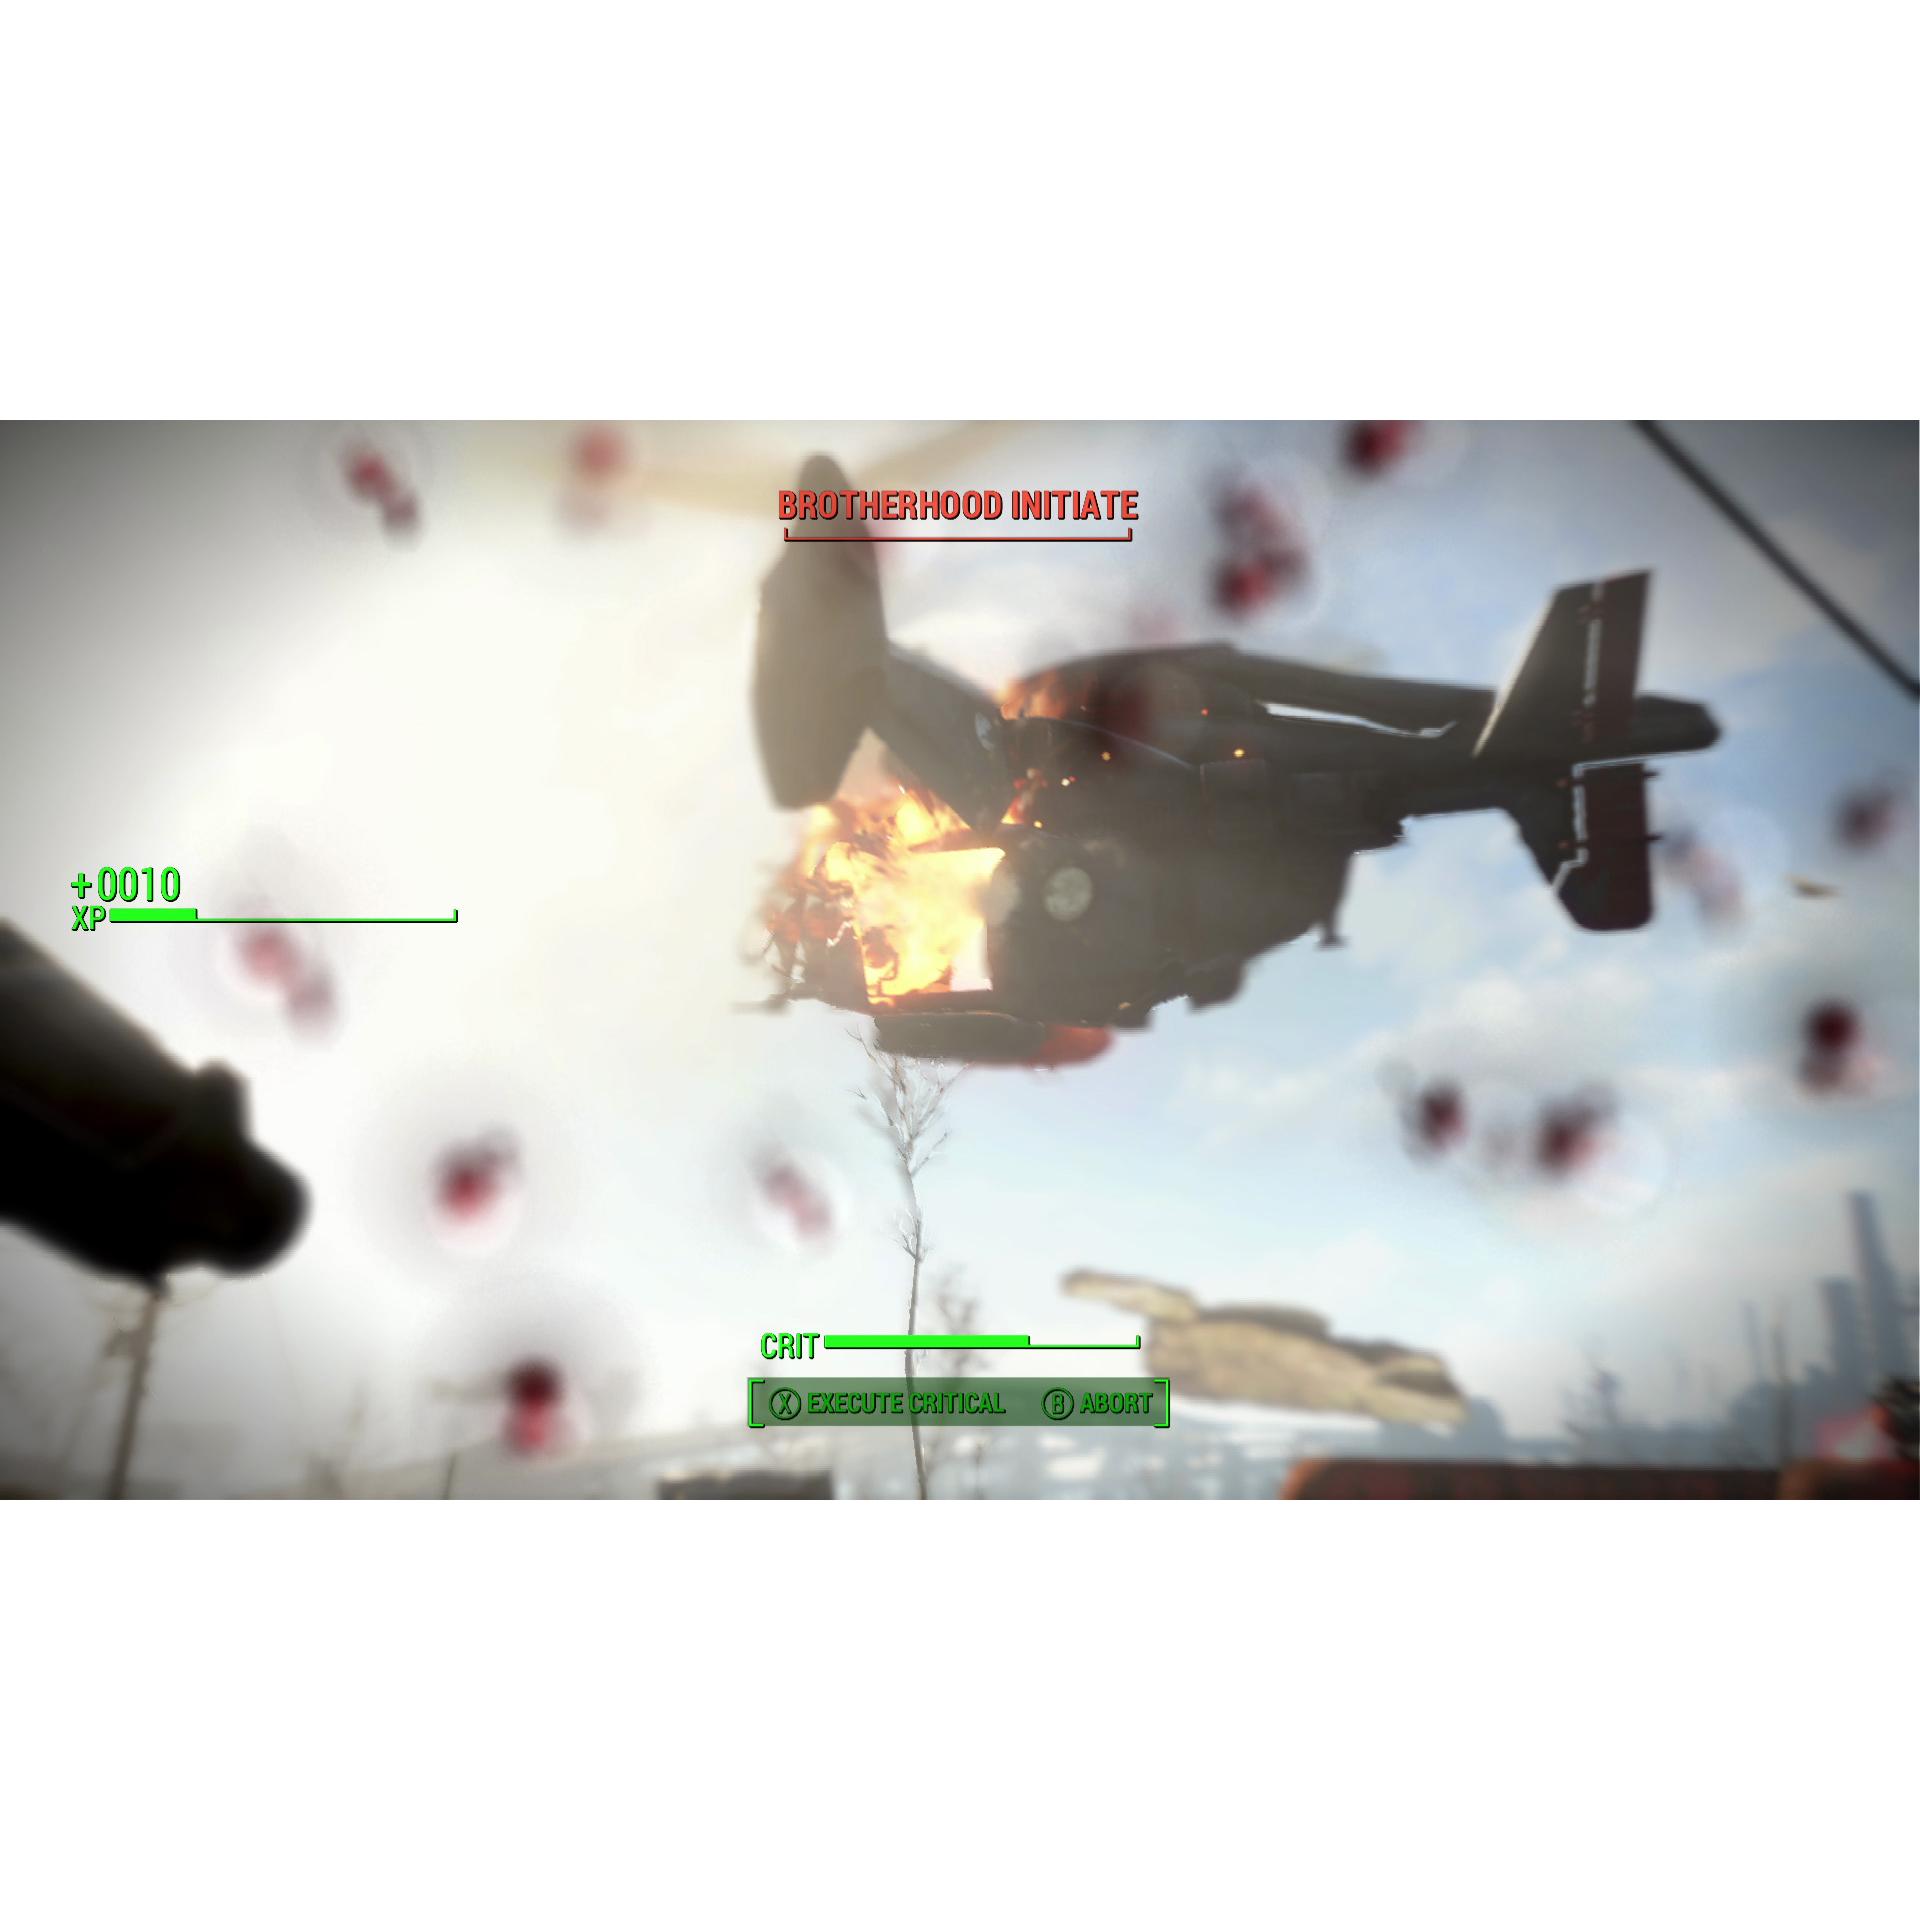 Joc Fallout 4 Goty pentru PlayStation 4 17